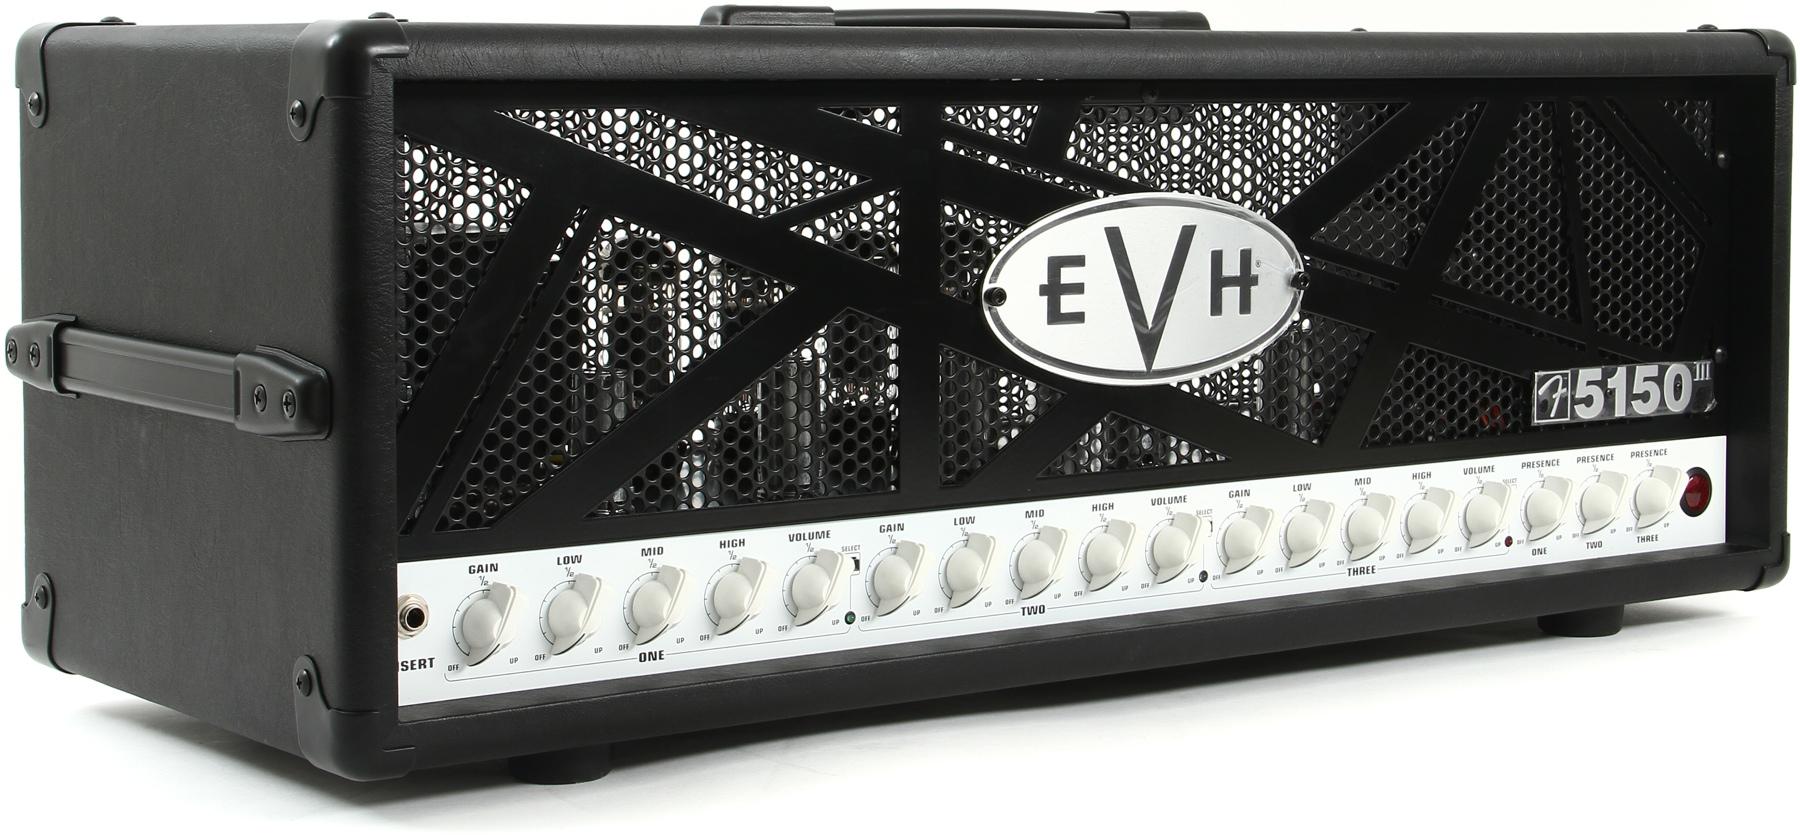 review evh 5150 iii 100w head don stick. Black Bedroom Furniture Sets. Home Design Ideas